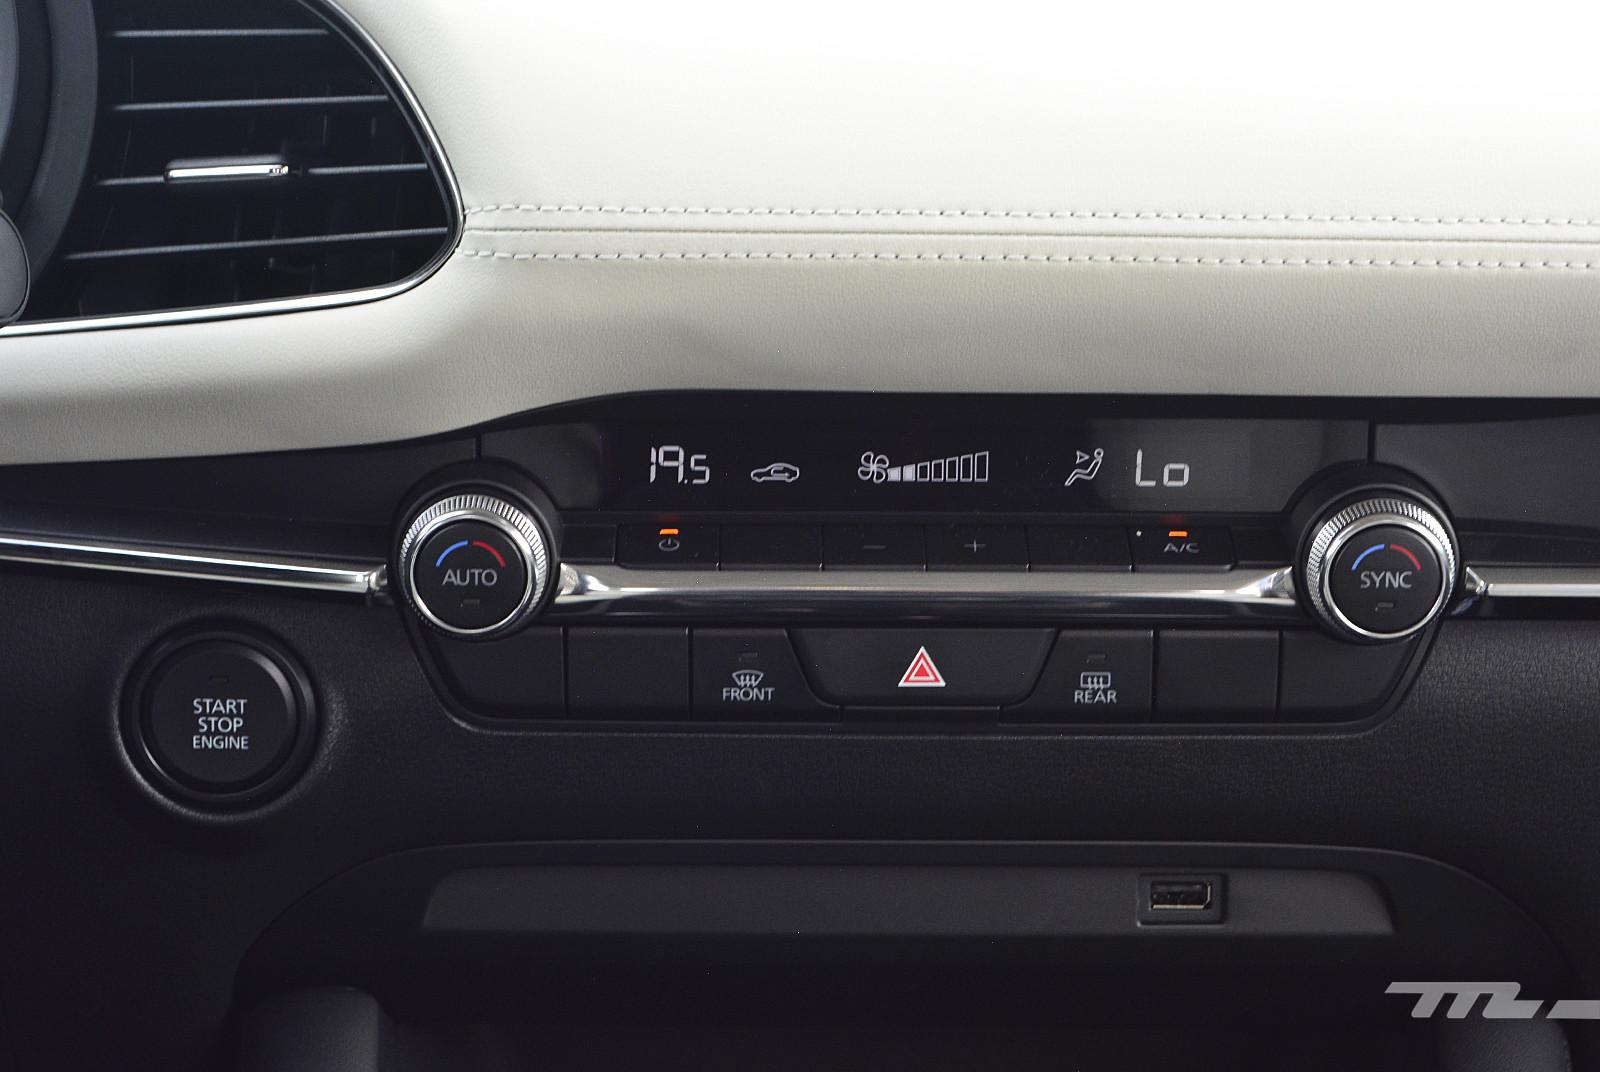 Foto de Mazda 3 vs. SEAT León (comparativa) (18/28)